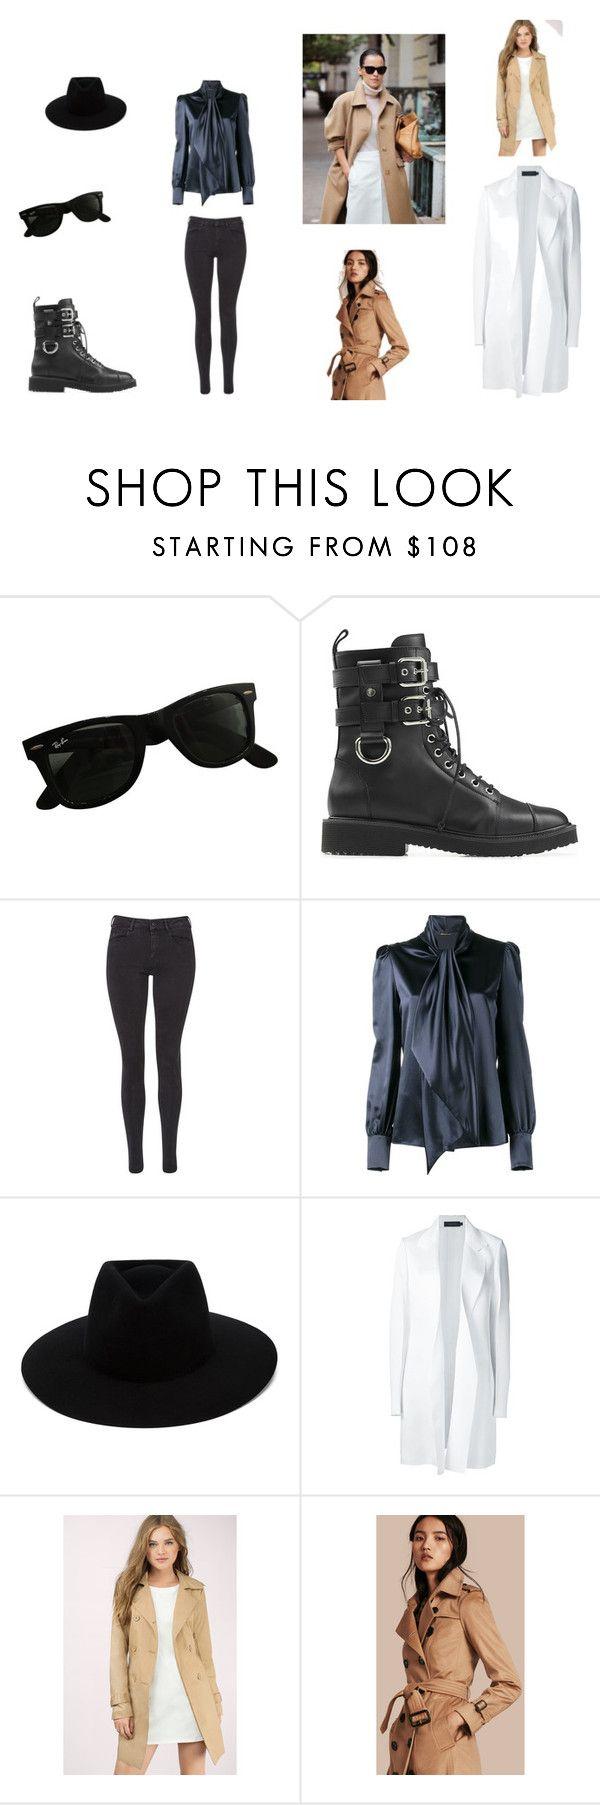 Nikshen Style by len-bon on Polyvore featuring moda, Yves Saint Laurent, Calvin Klein Collection, Burberry, Tobi, Maison Scotch, Giuseppe Zanotti, rag & bone and Ray-Ban